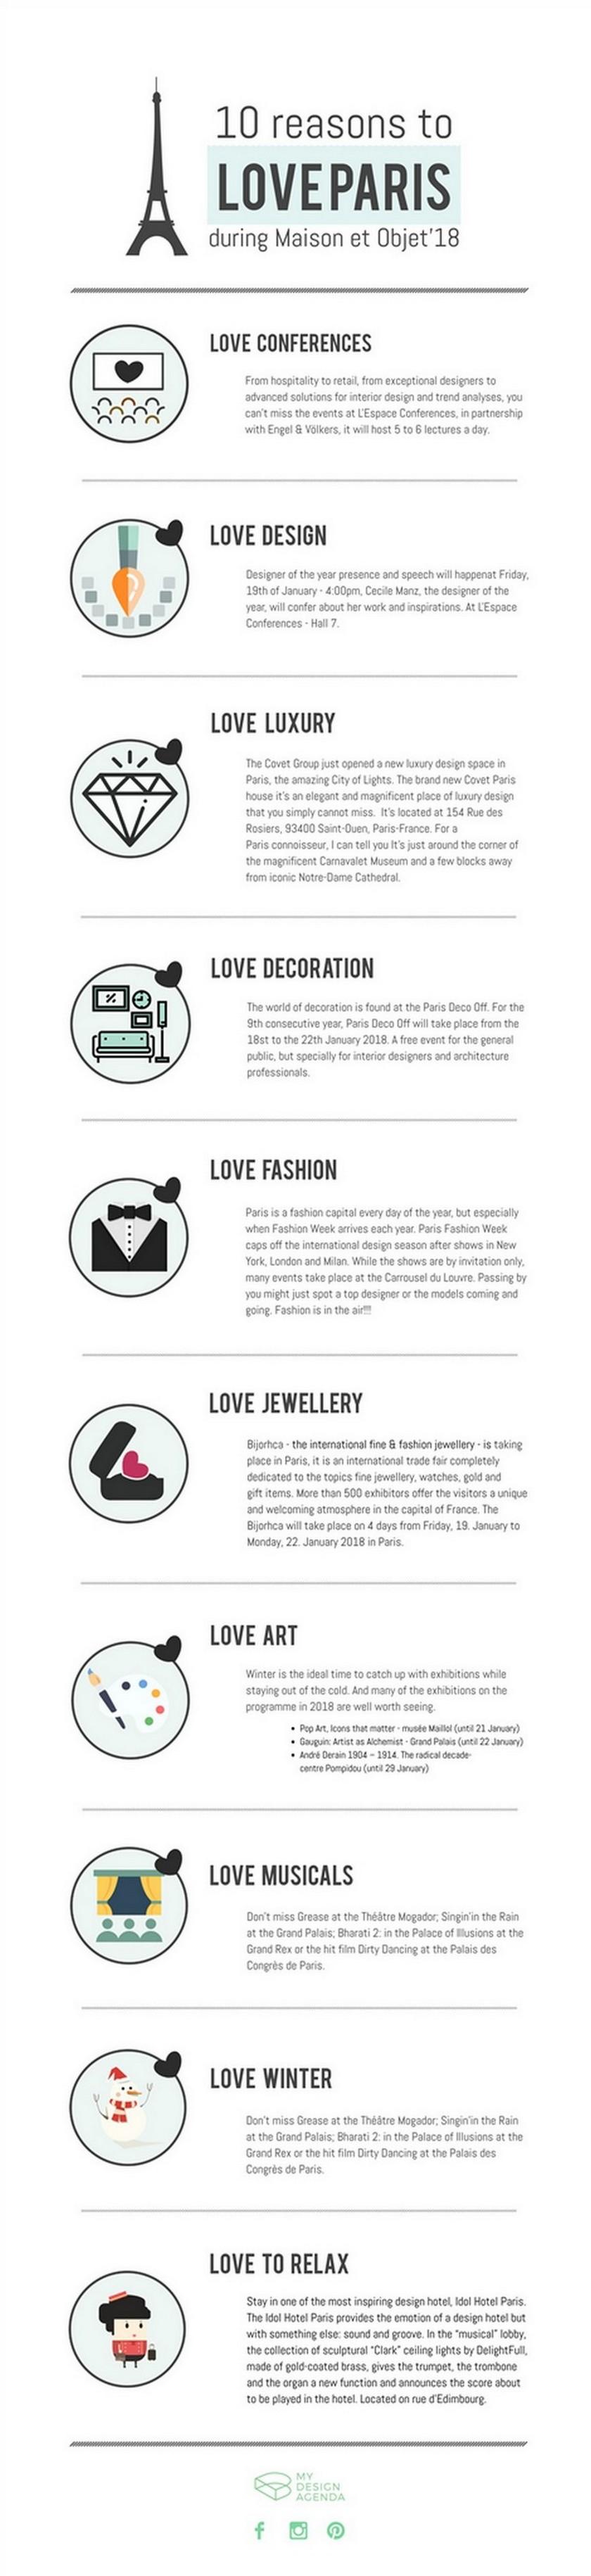 Here's Why You Must Visit Paris Beyond Maison Et Objet 2018 > Daily Design News > The latest news and trends in the design world > #maisonetobjetparis #maisonetobjt2018 #dailydesignews